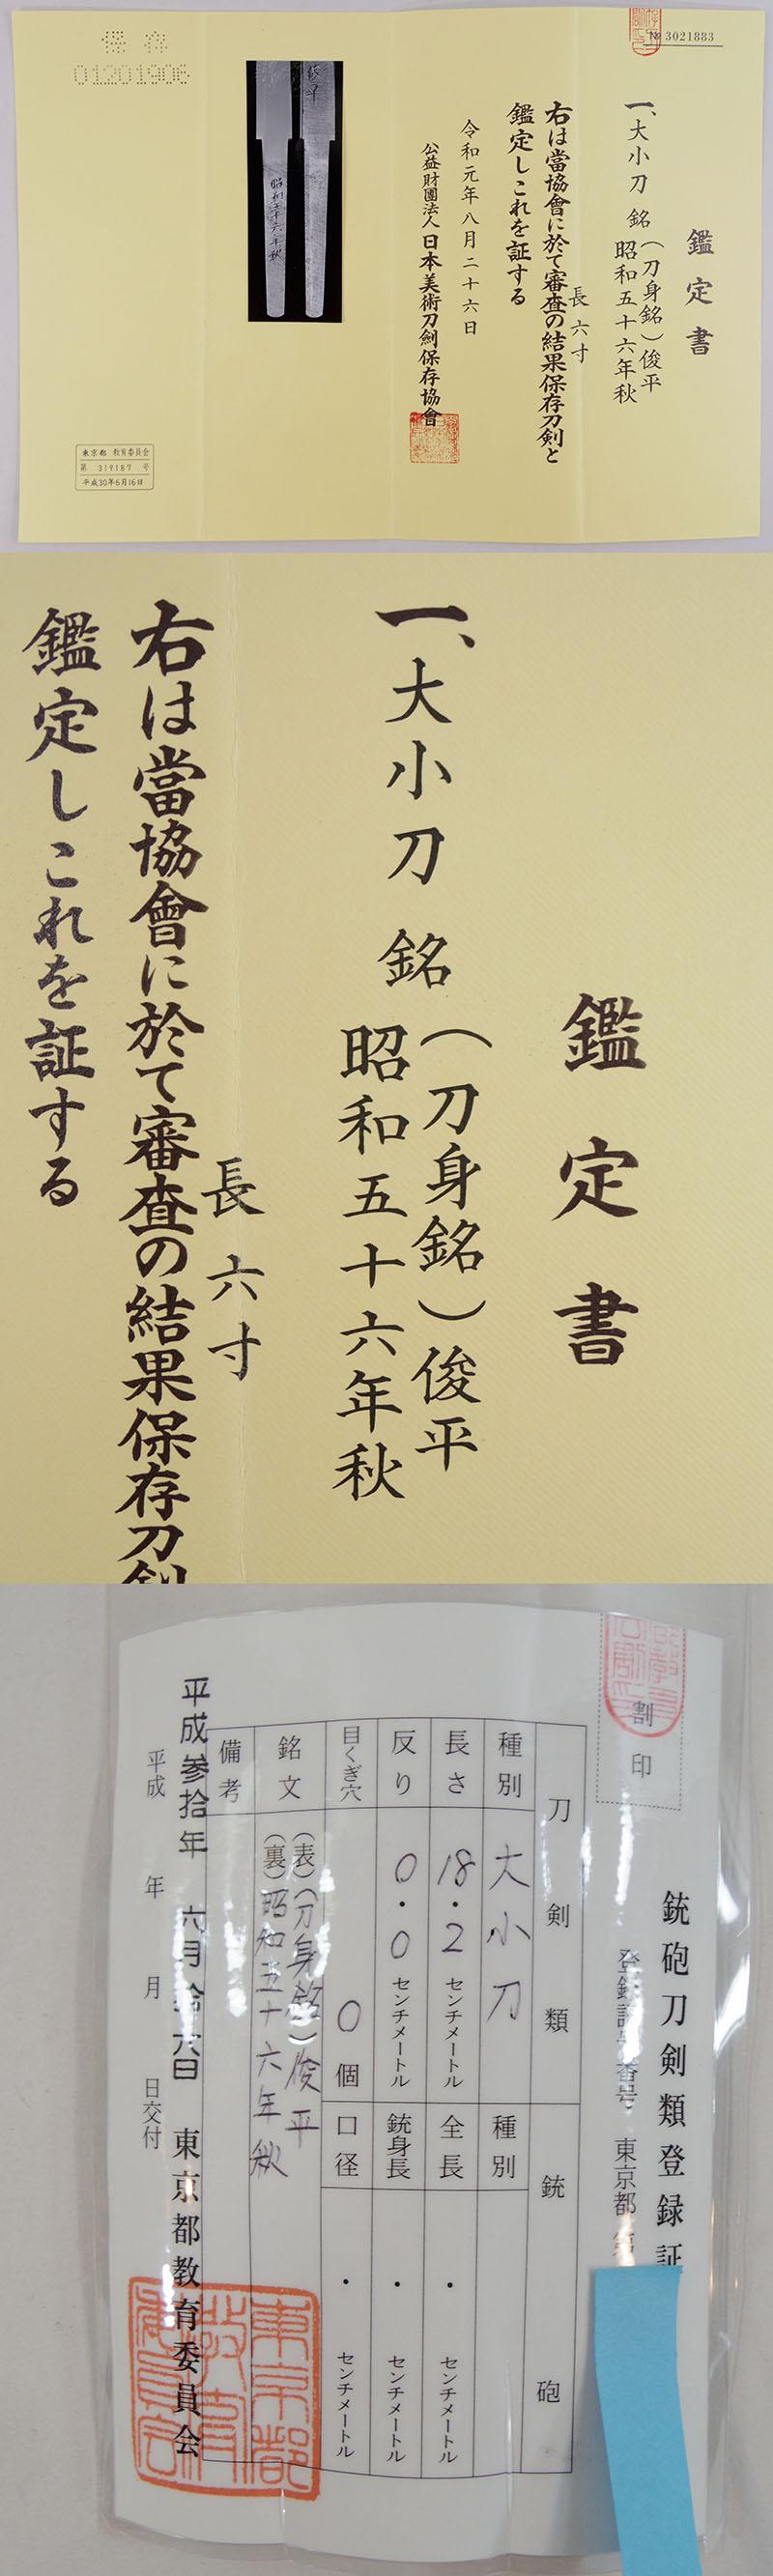 俊平(大隅俊平) Picture of Certificate